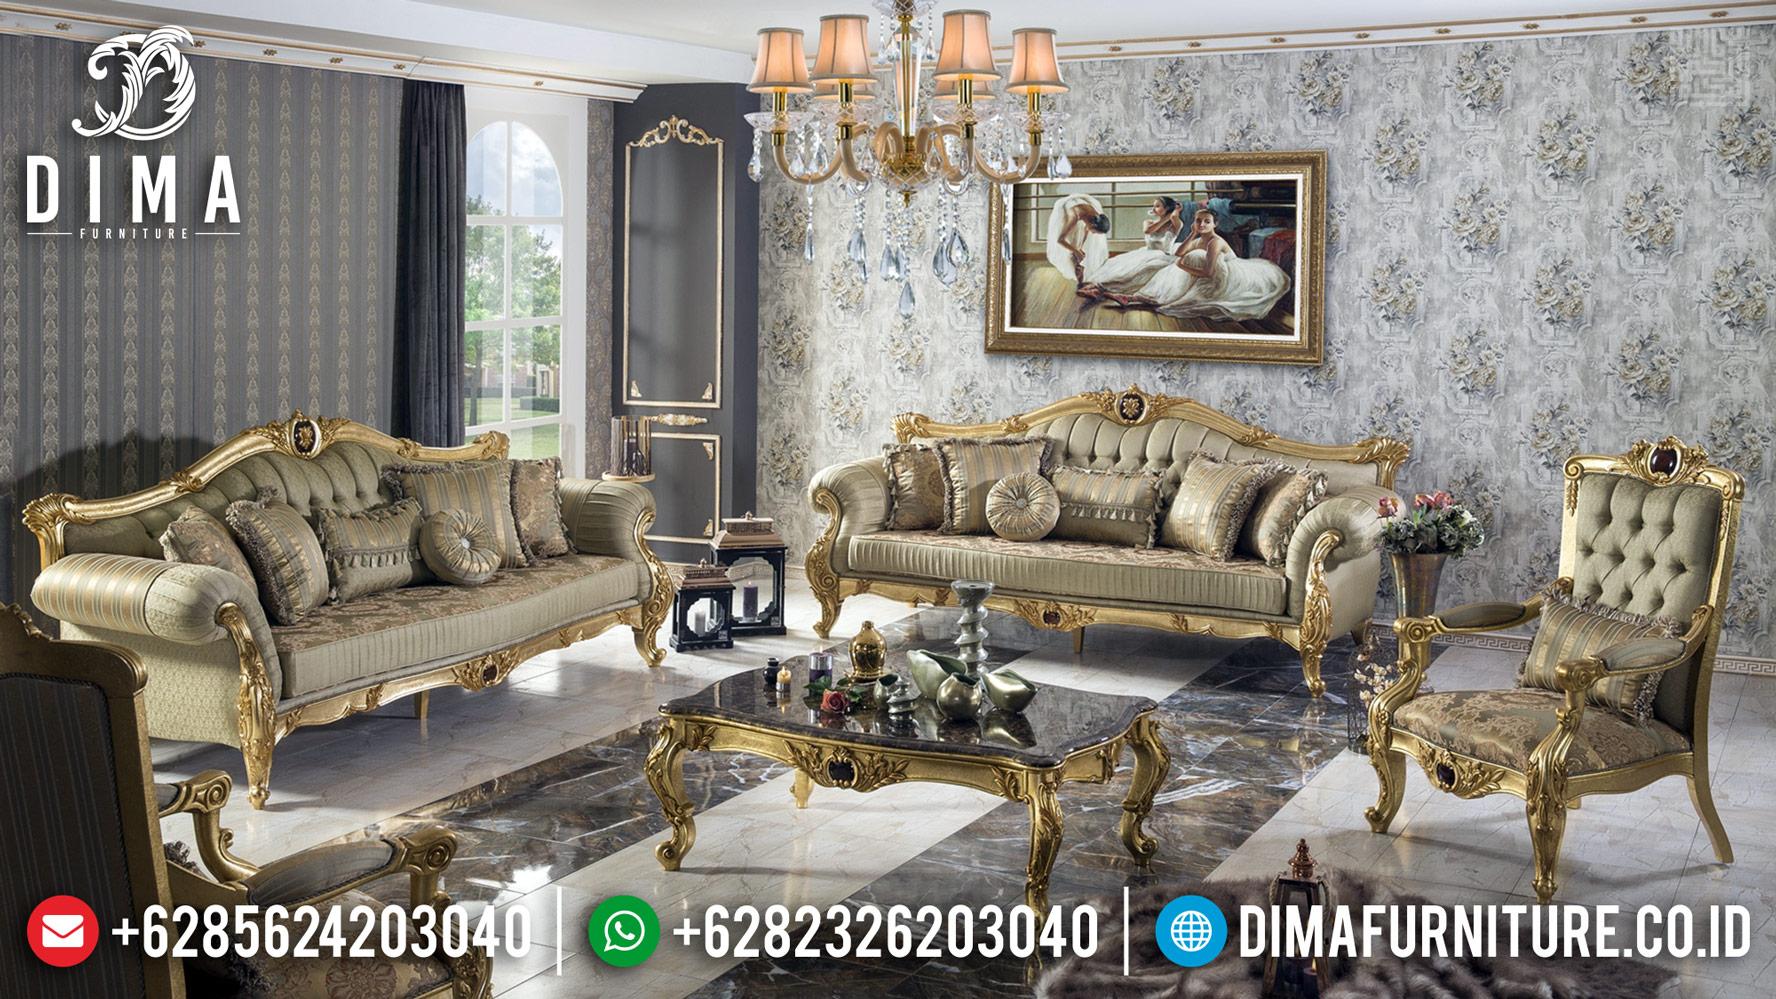 New Design Sofa Tamu Mewah Jepara Golden Kai Superior Luxury TTJ-0443